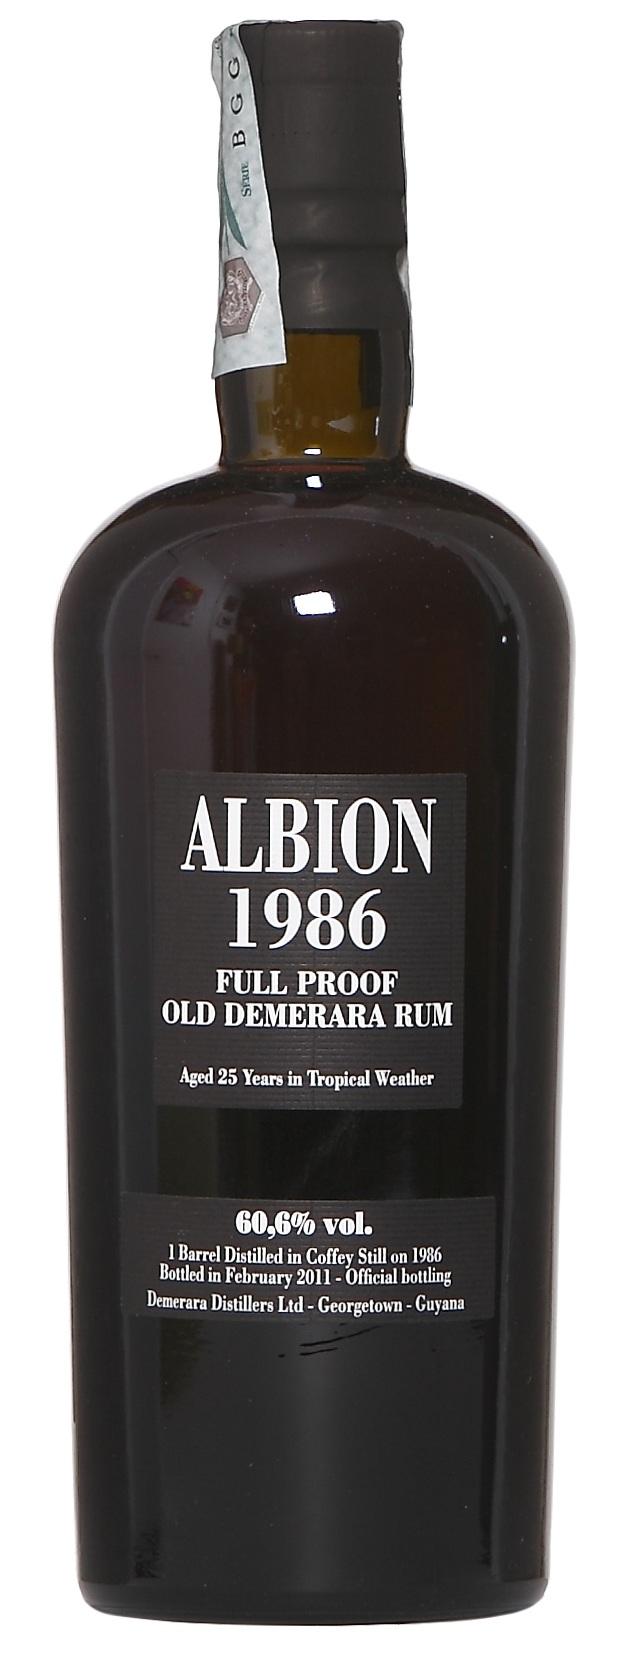 Albion 1986 crop